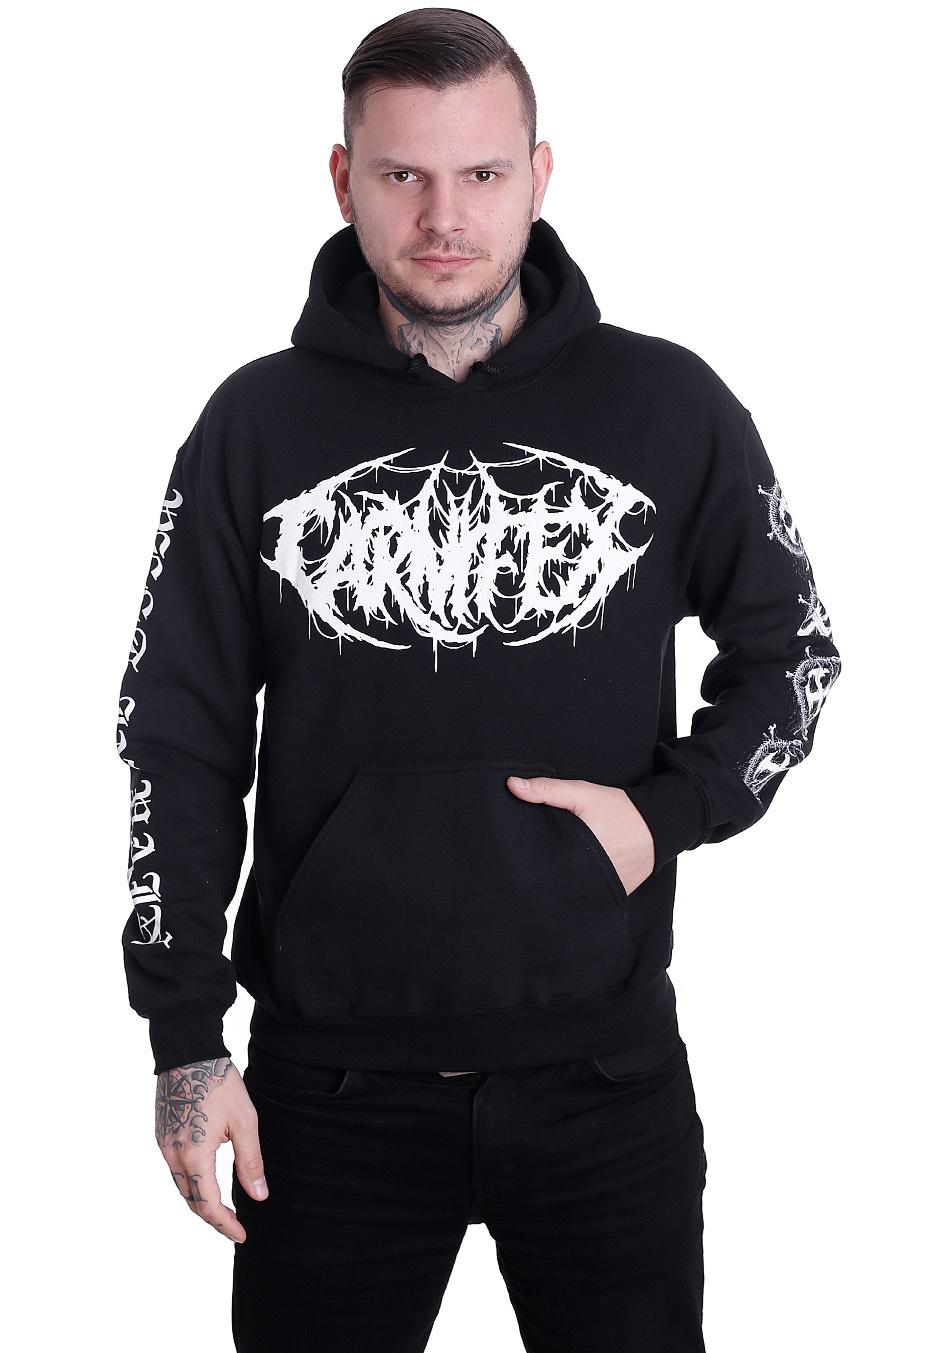 Carnifex hoodie